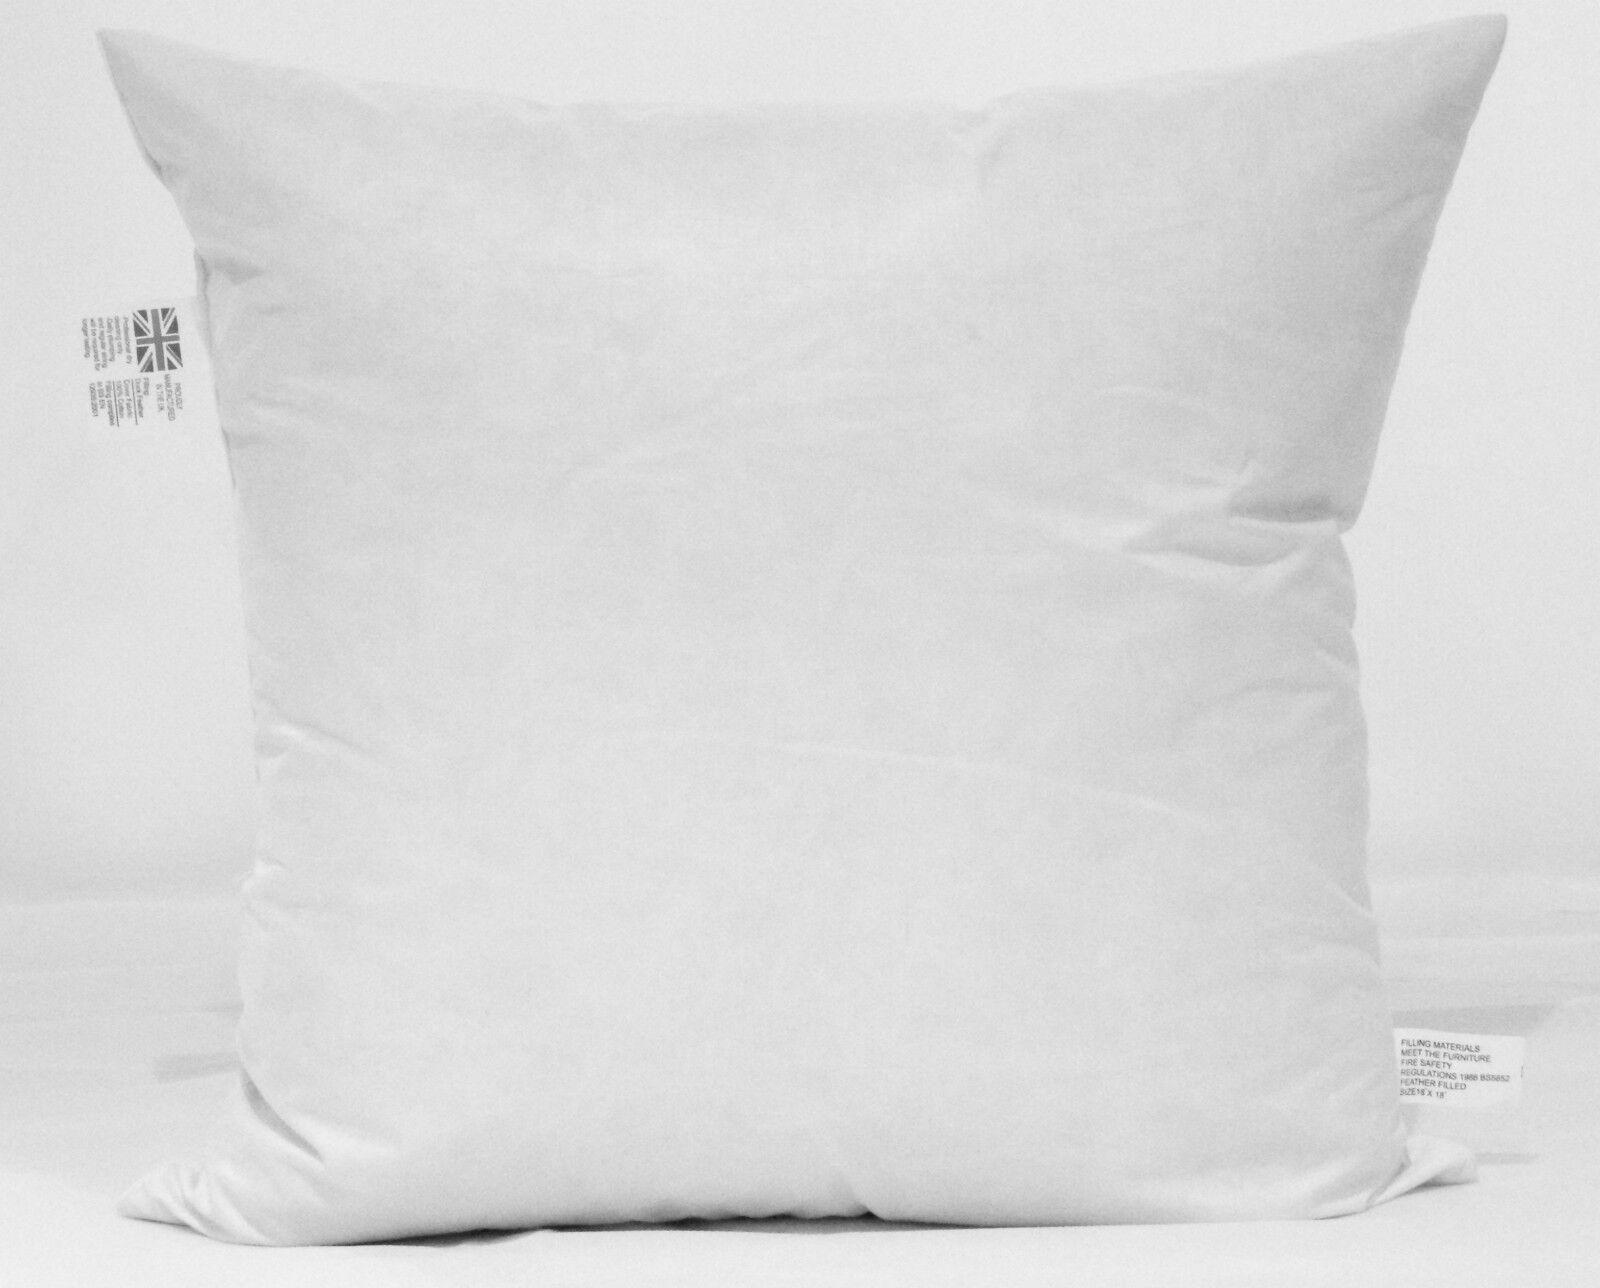 5 x 24 x 24 Cuscino di piuma di anatra Cuscinetti Imbottiti Inserti-bianca pad British made